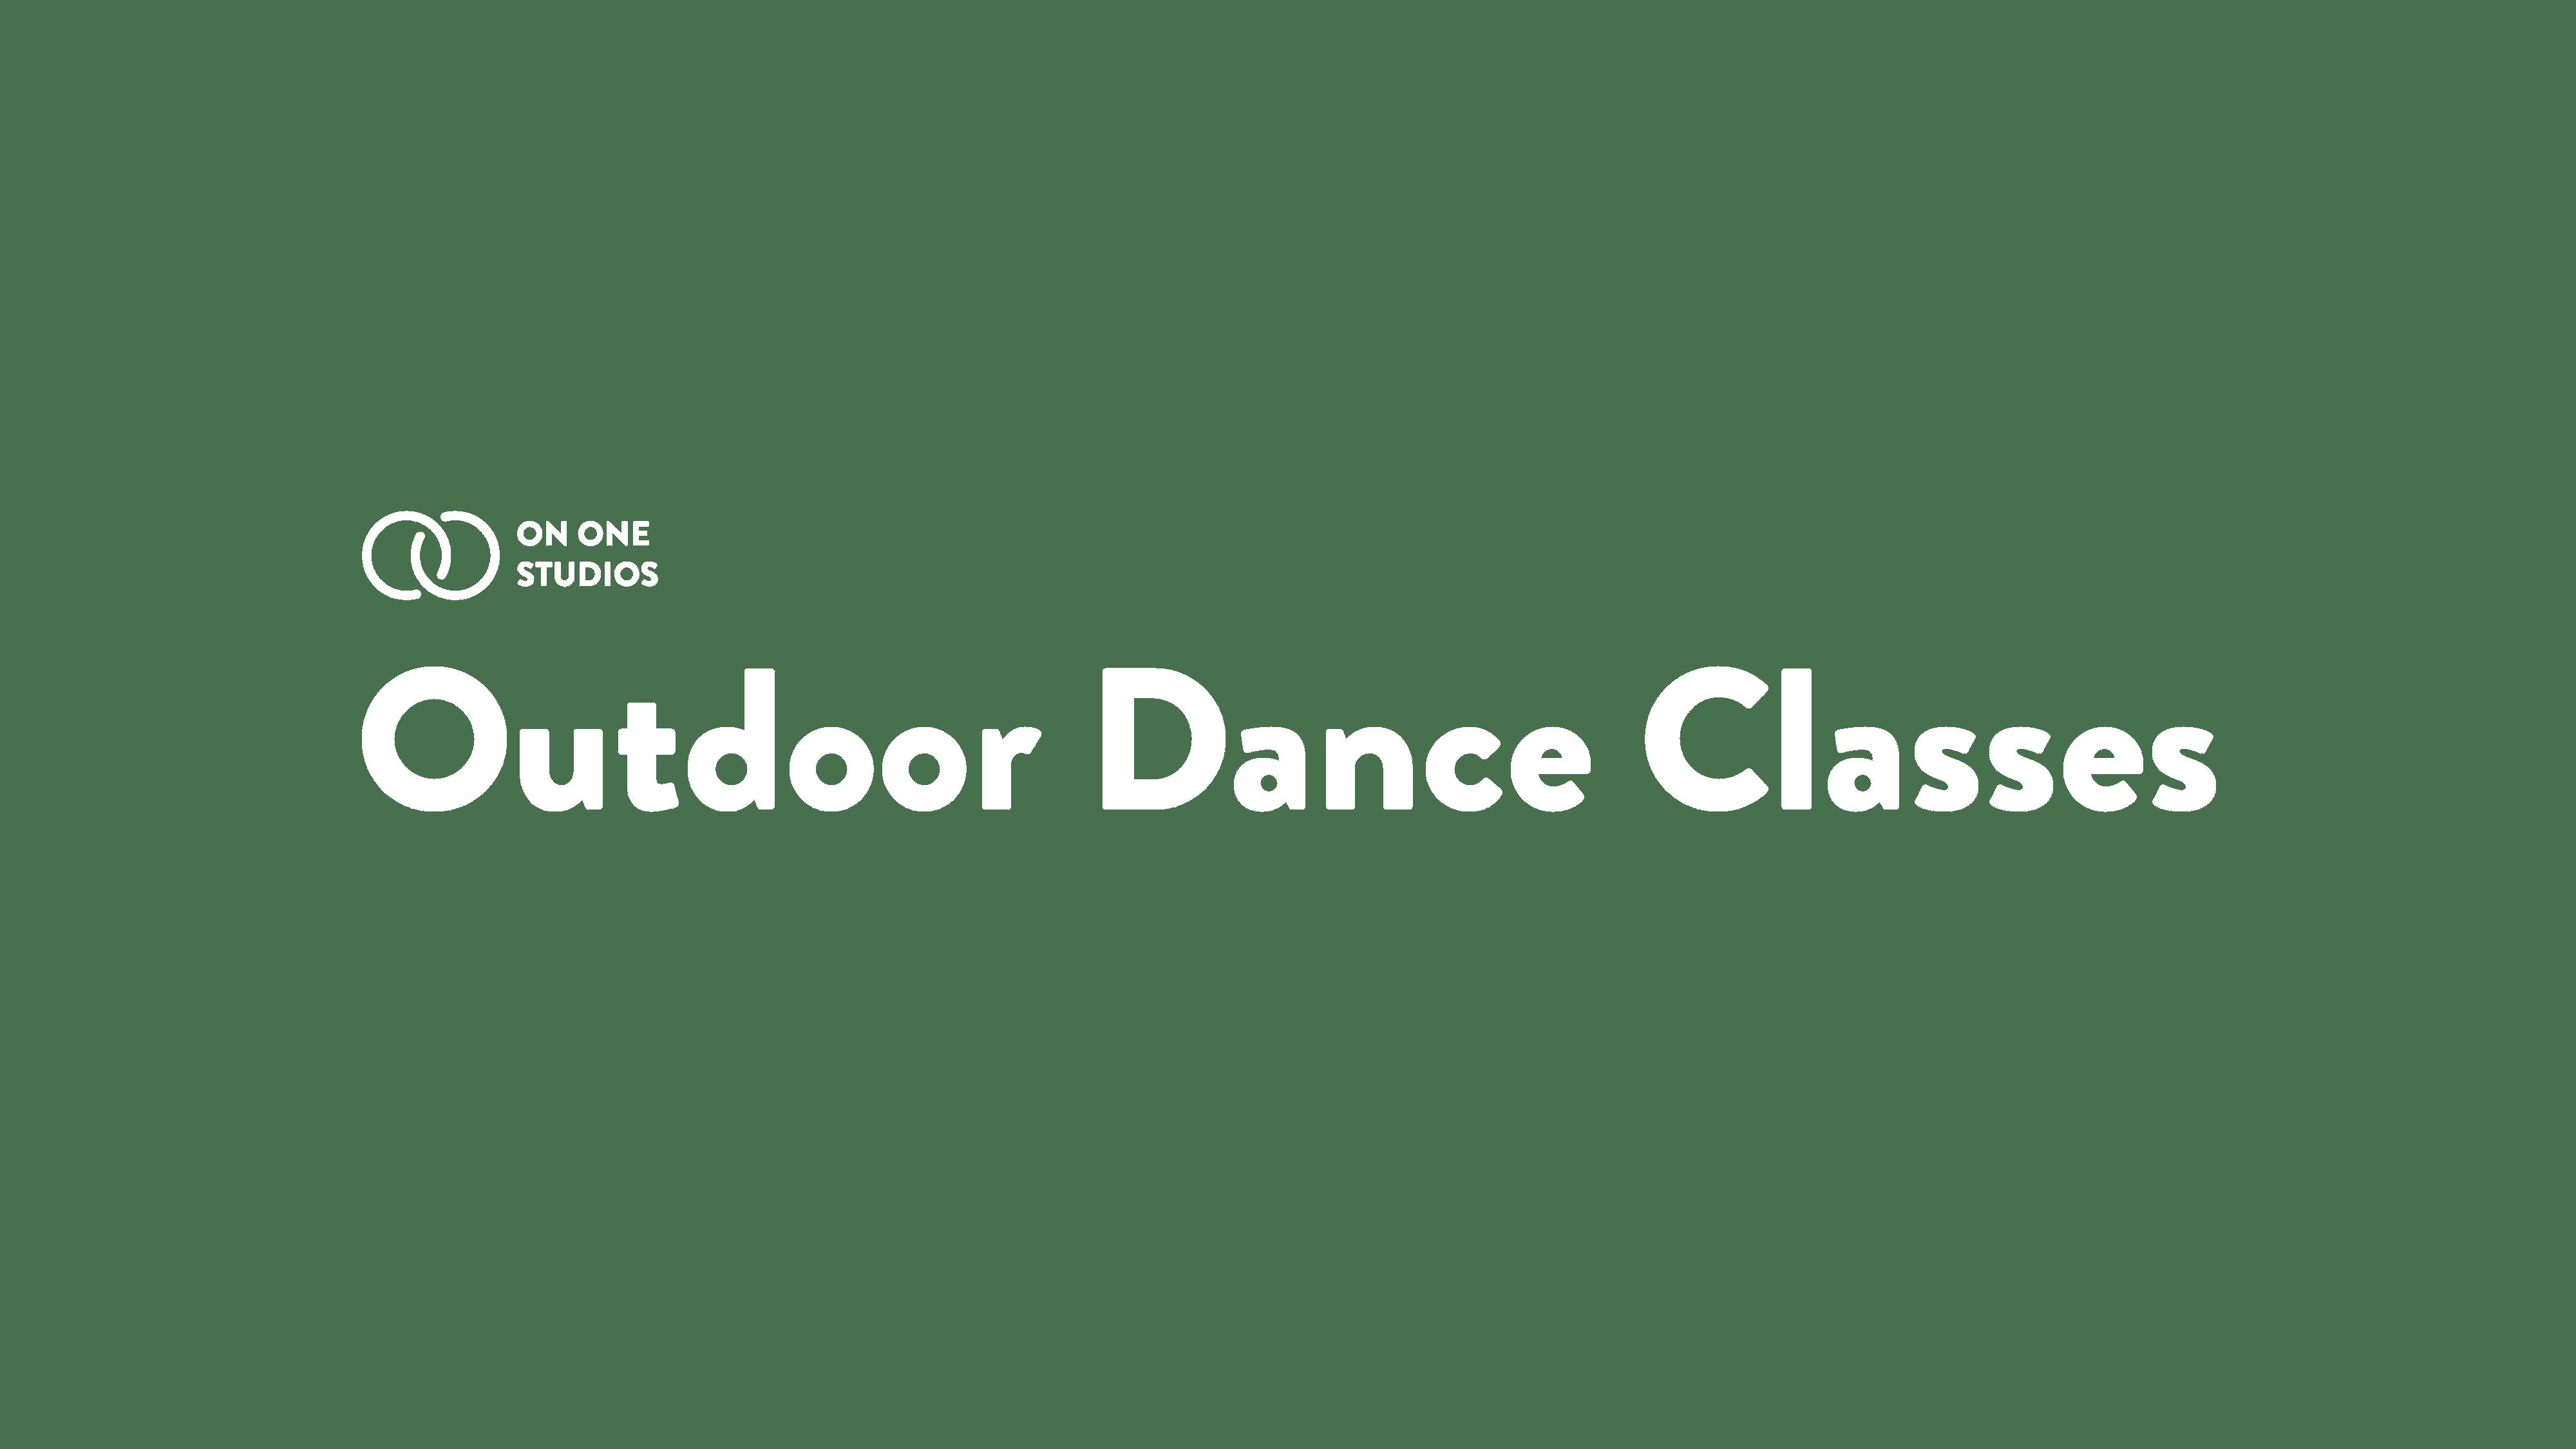 outdoor dance classes, Outdoor Dance Classes